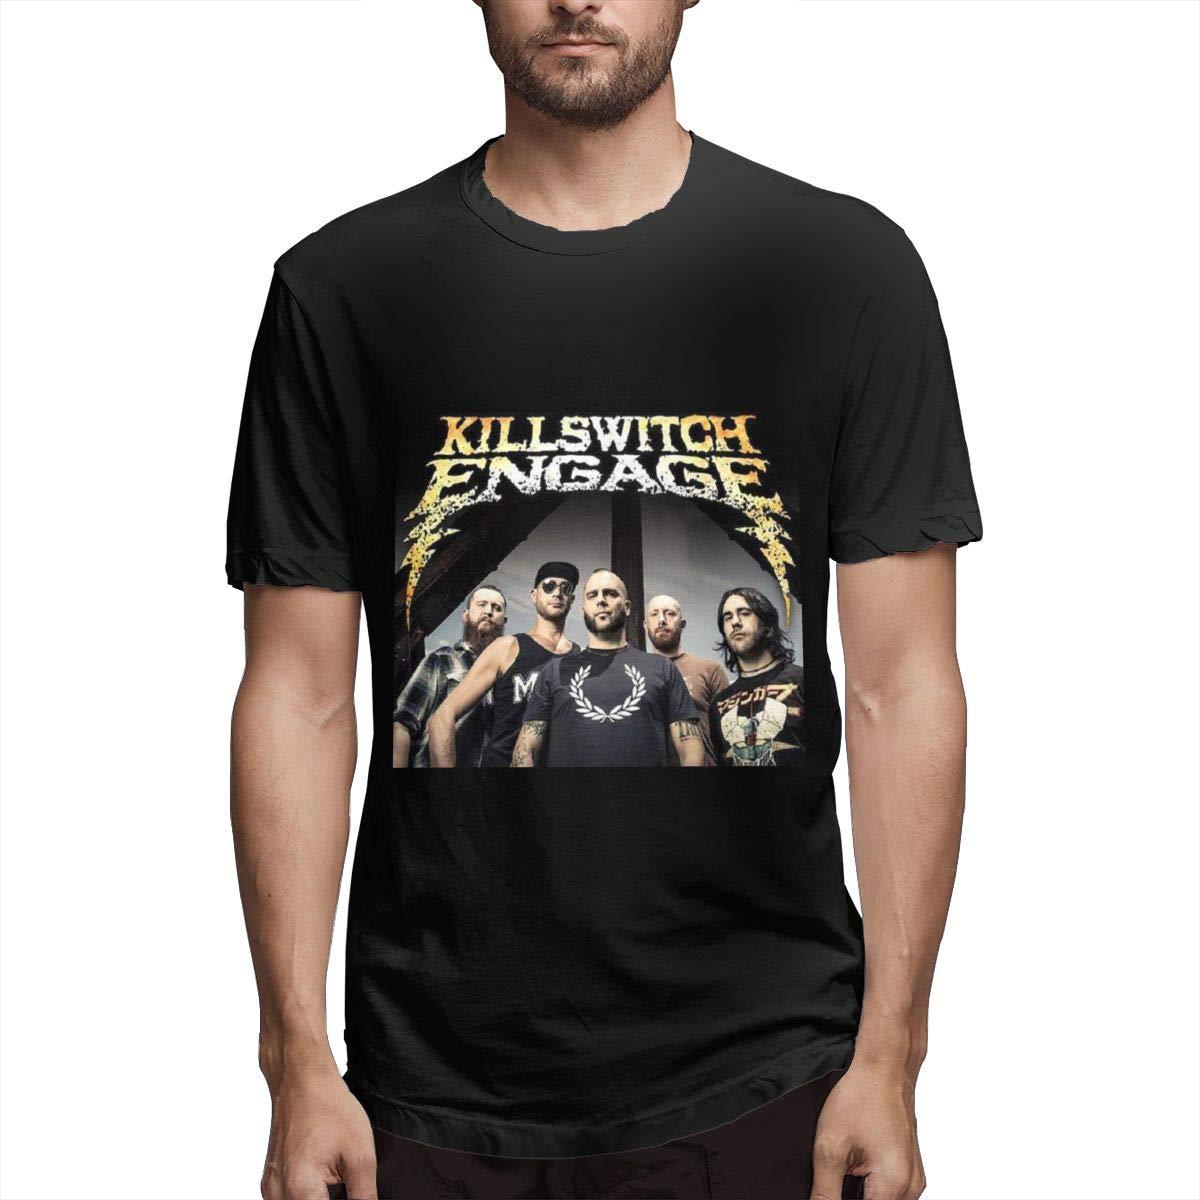 Lihehen S Killswitch Engage Round Neck T Shirt